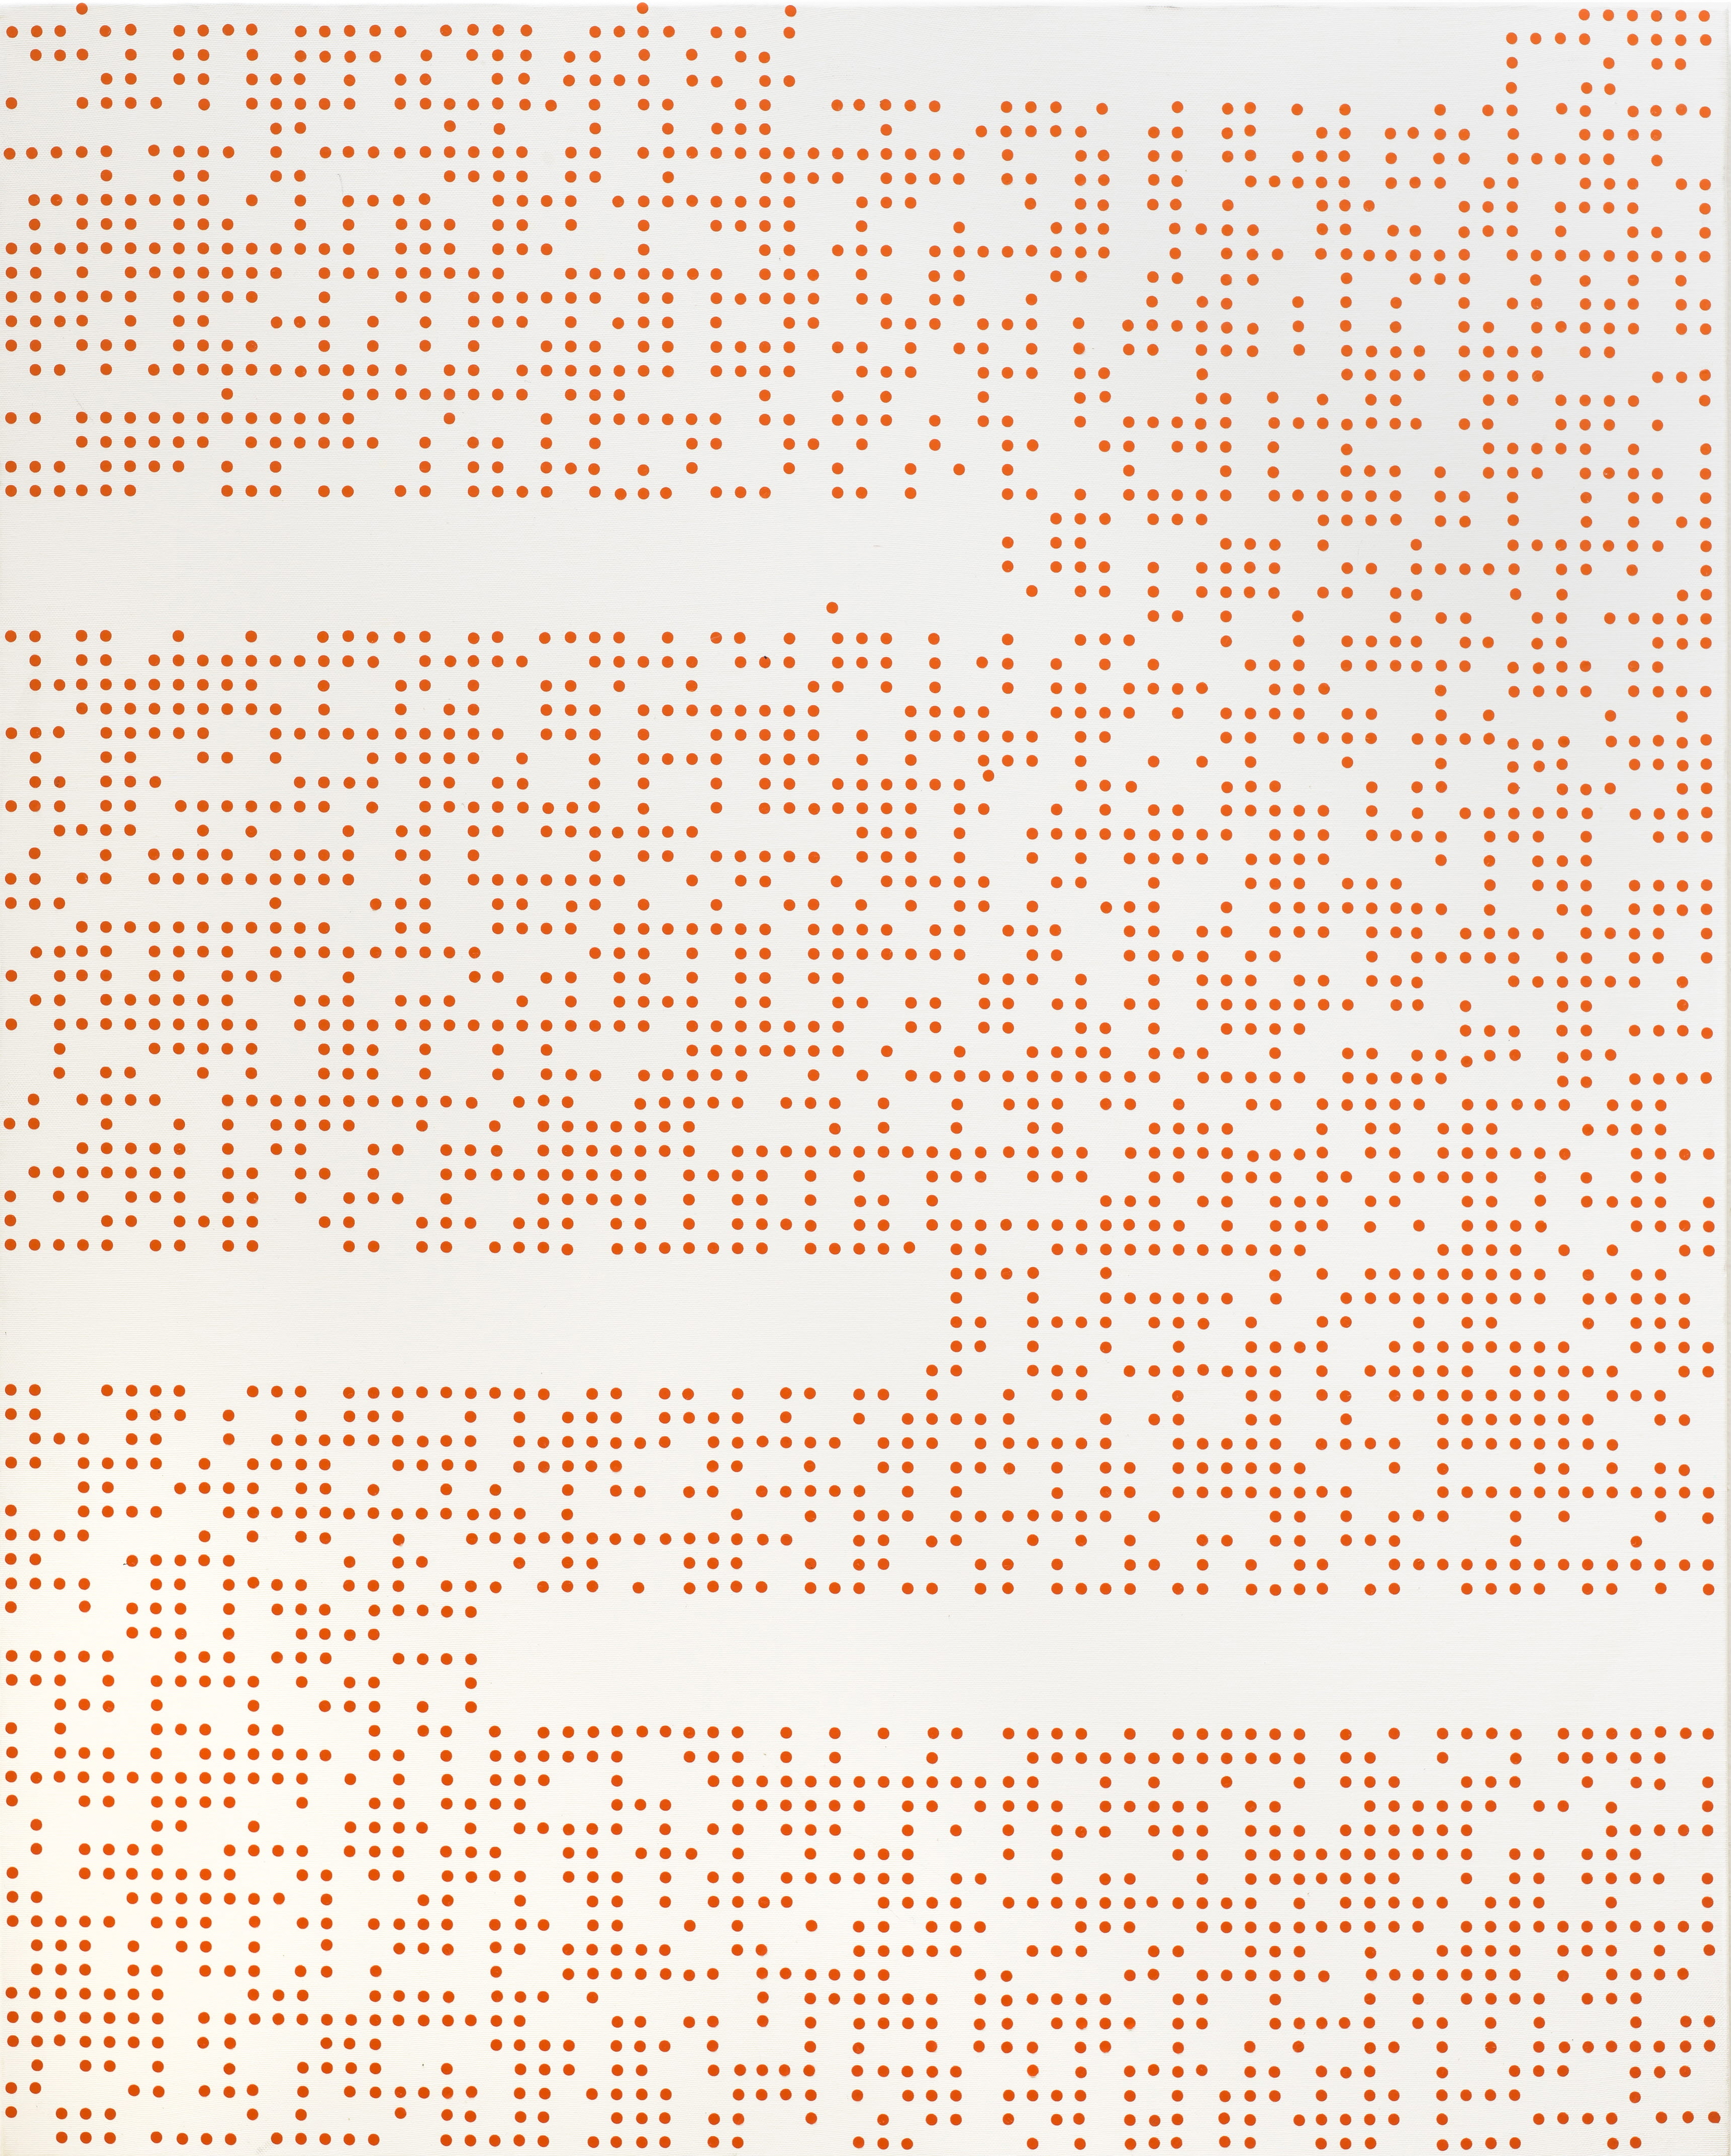 ENCODING 2015, Acrylic on canvas, 90.9 x 72.7cm (3)